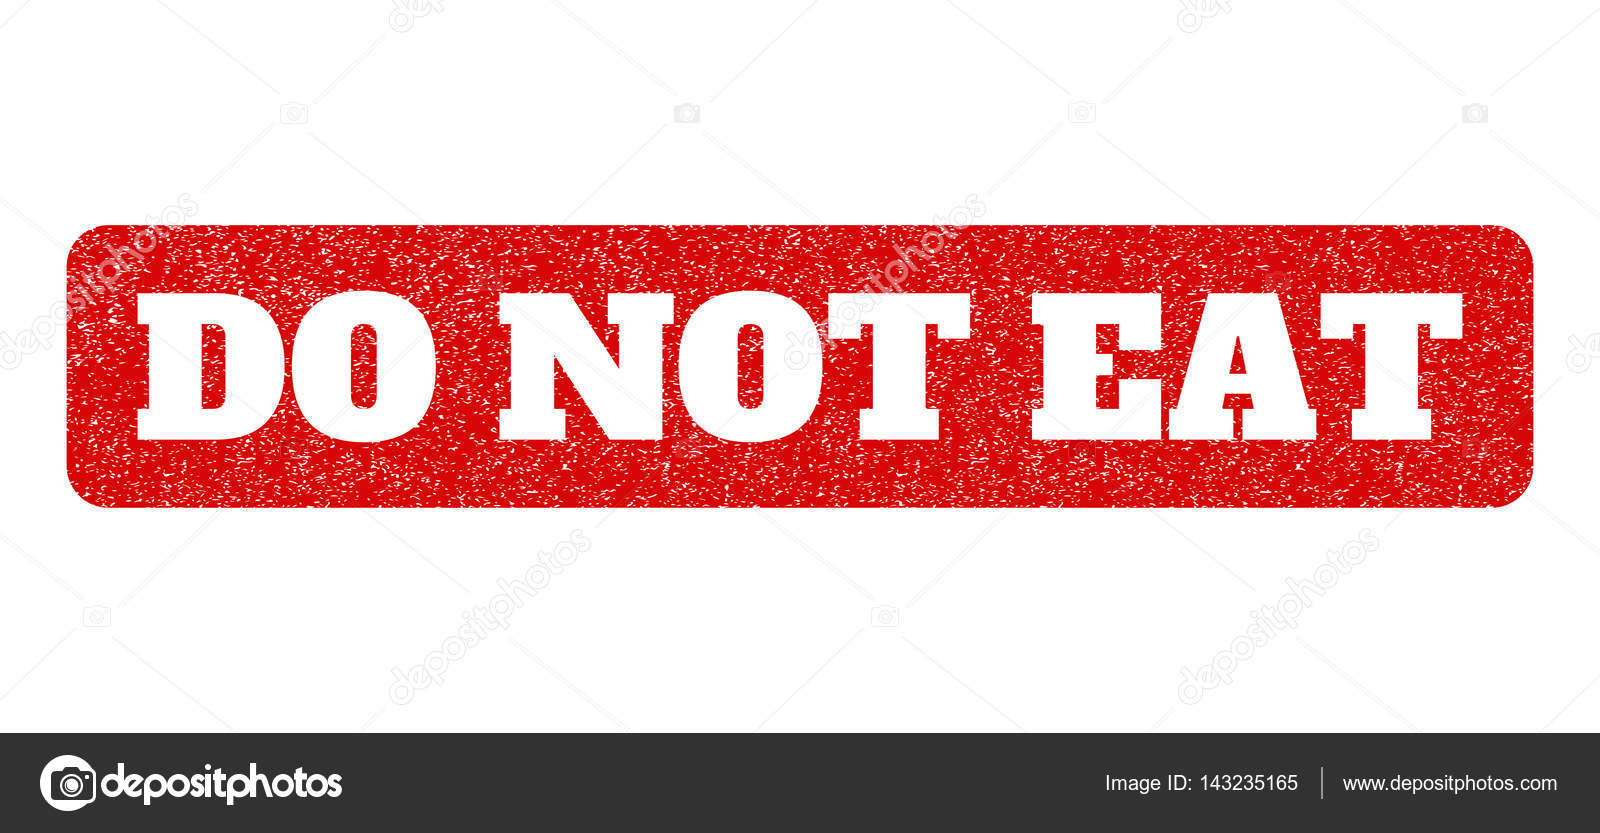 Etiket: yemek yapmak